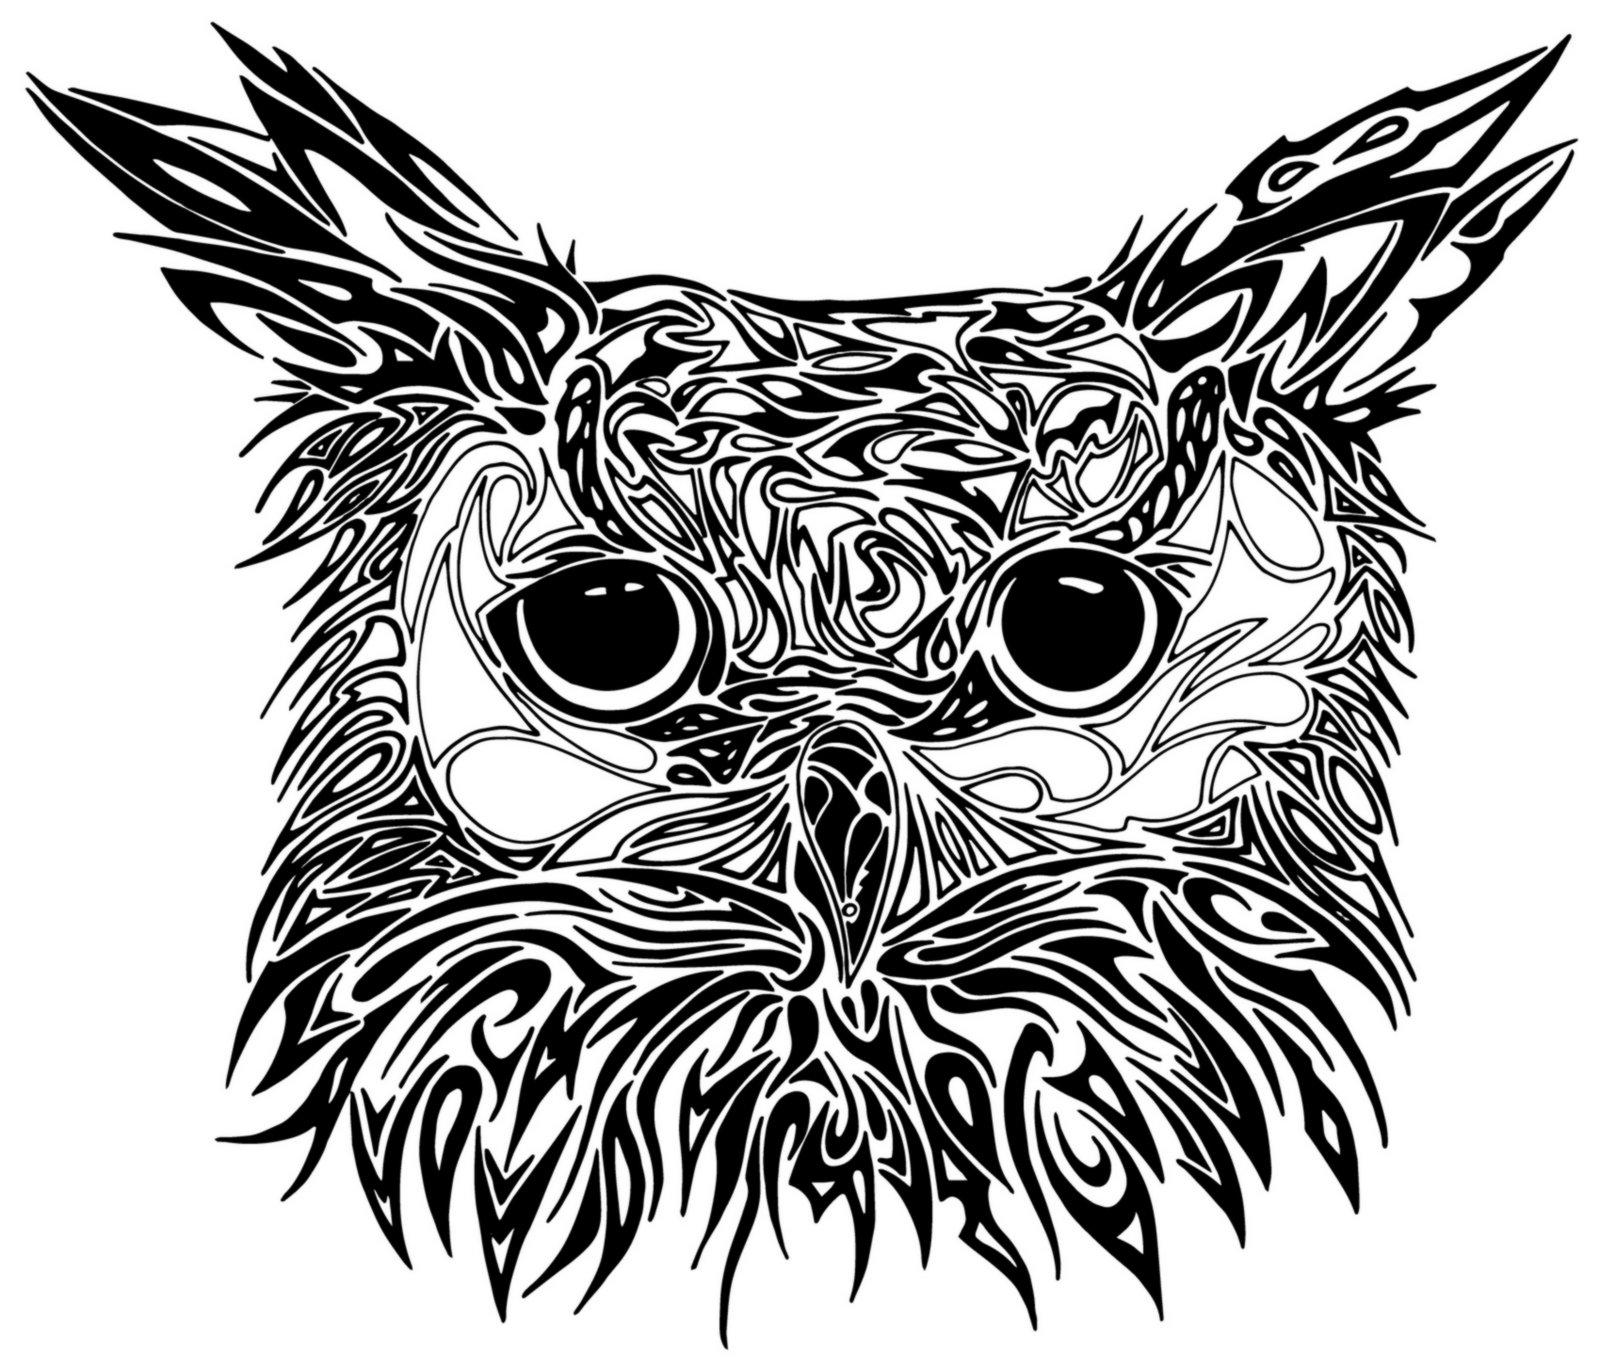 Drawn owl tribal #10